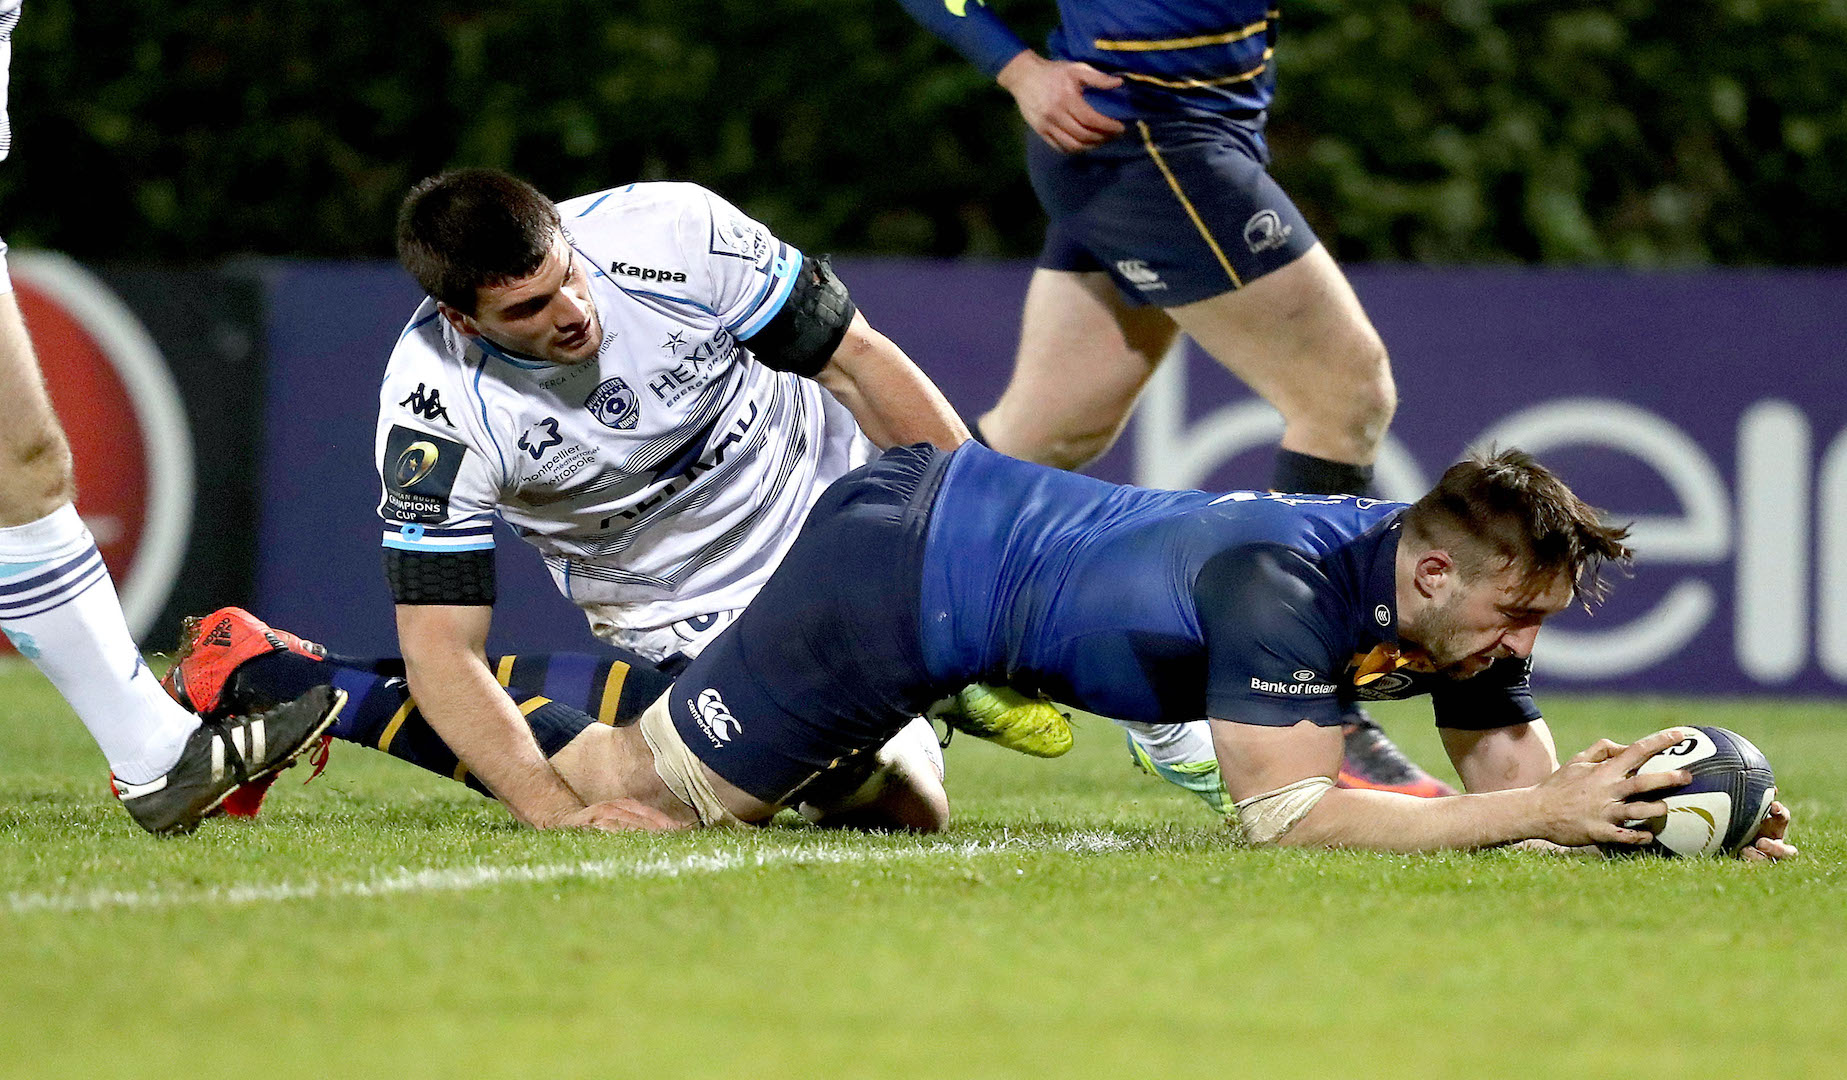 LionsWatch: Leinster launch into European Champions Cup quarter-finals